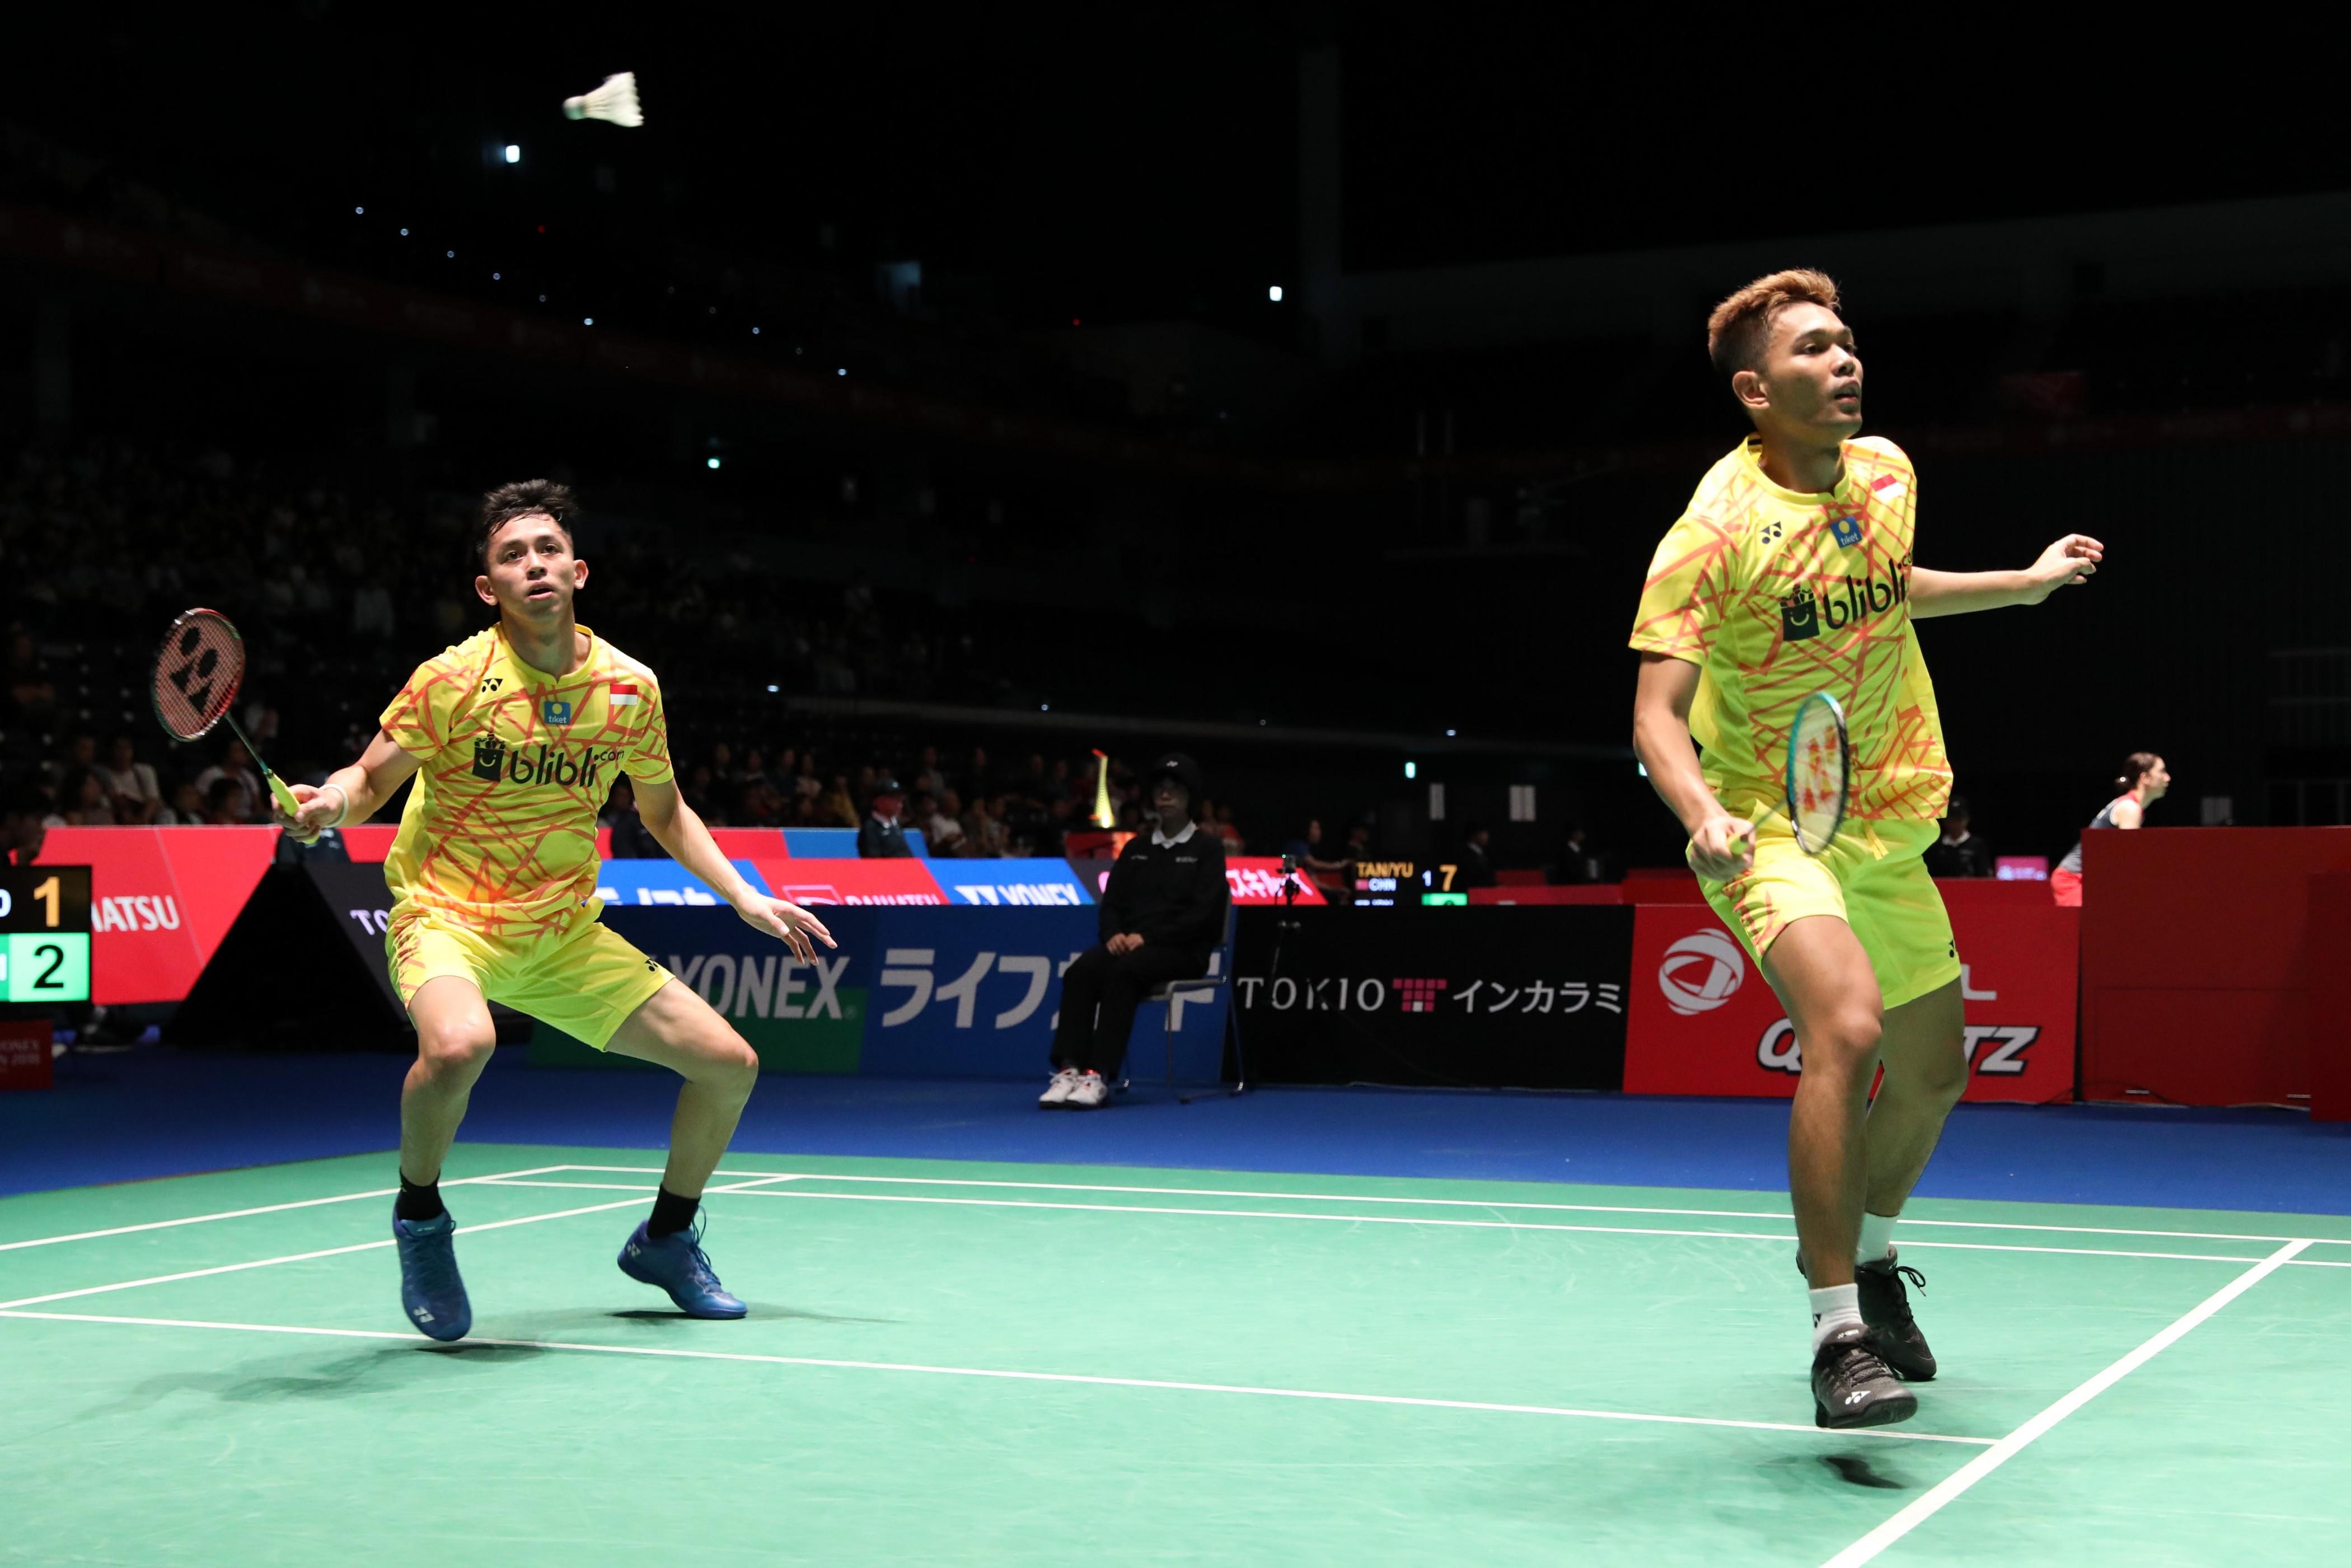 Fajar/Rian Susul Kevin/Marcus ke Perempat Final Japan Open 2018